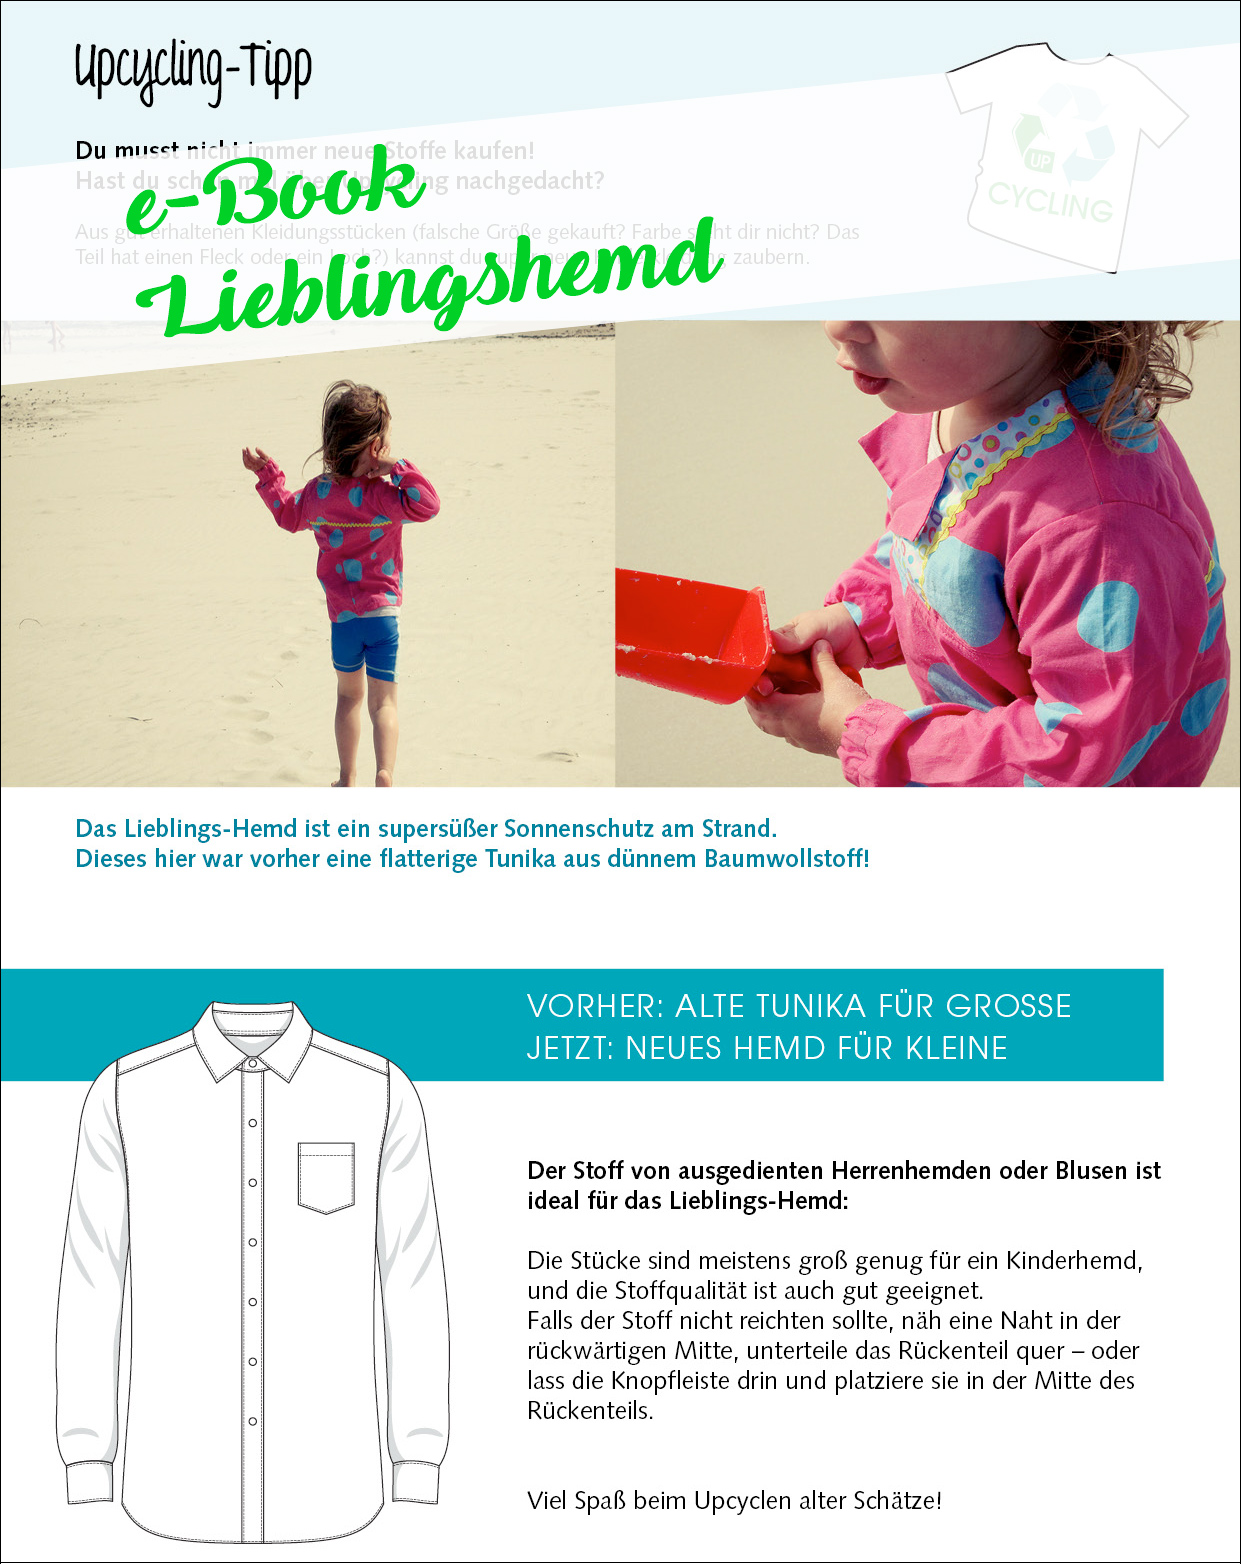 Upcycling-Tipp: kinderhemd aus baumwollstoff nähen